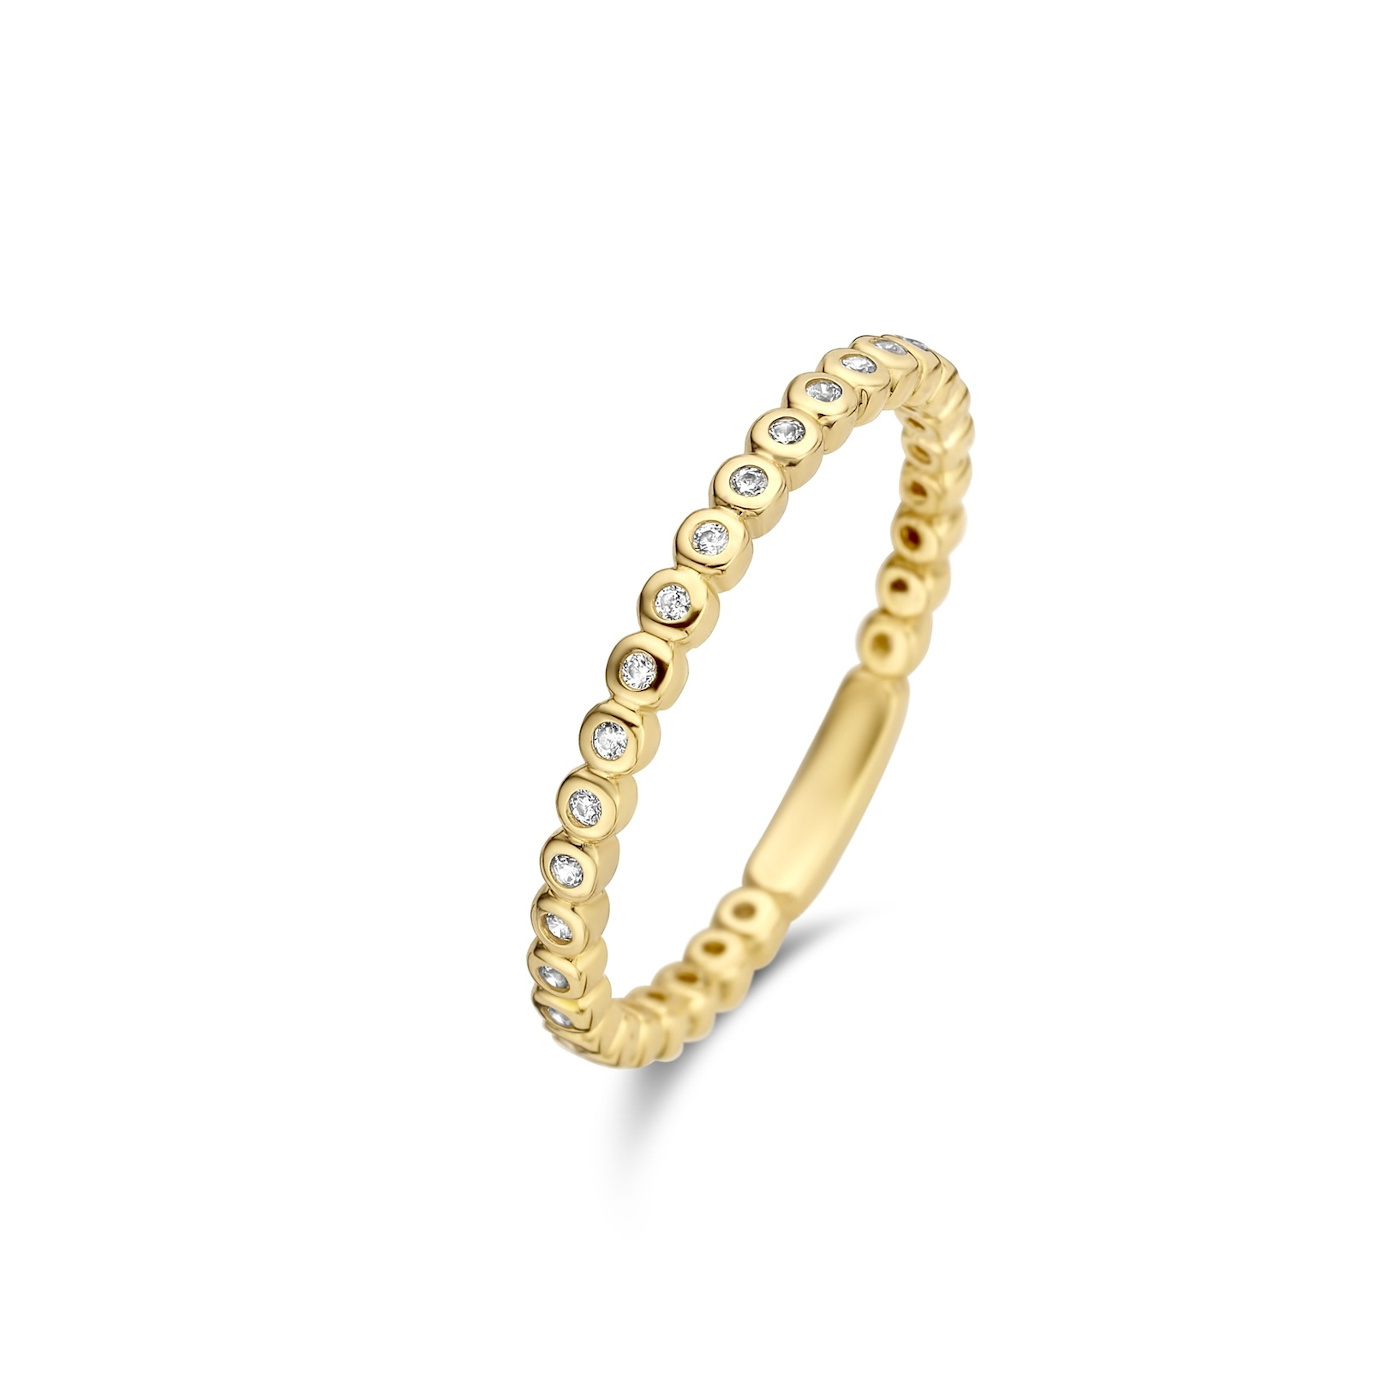 Isabel Bernard Le Marais Aélys 14 karaat gouden ring met zirkonia